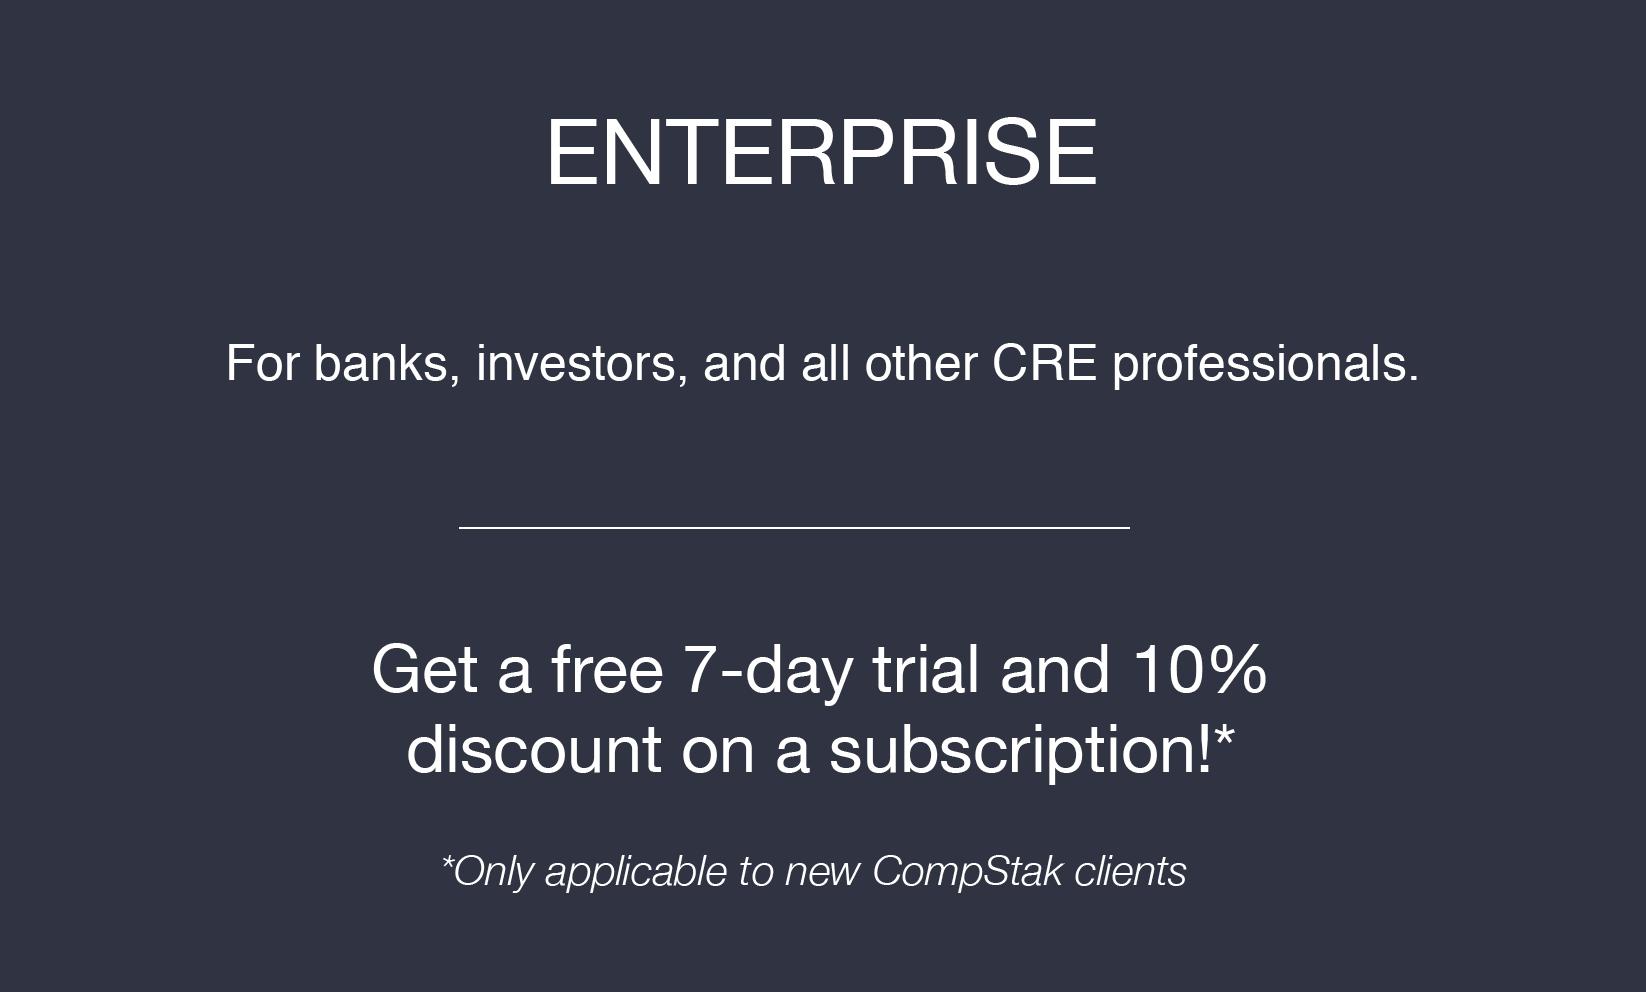 CompStak Enterprise